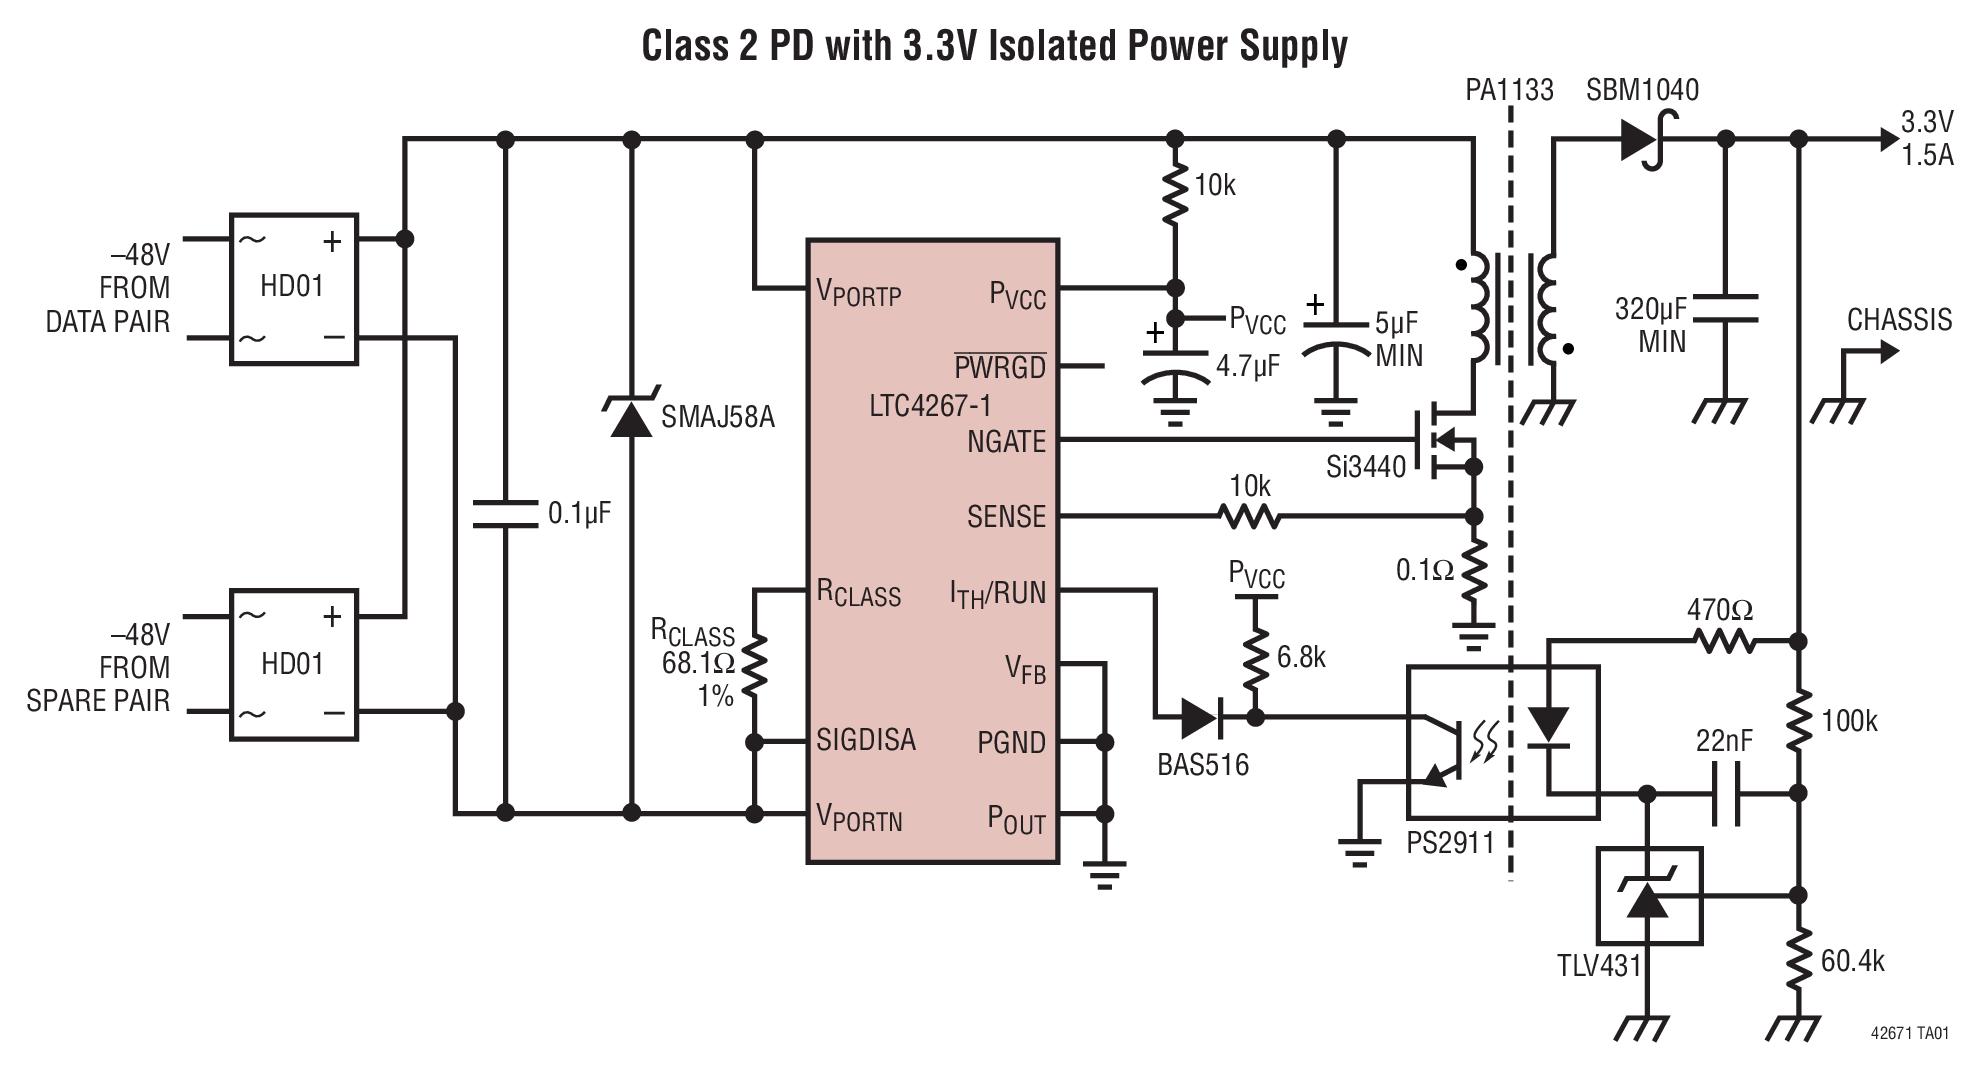 LTC4267-1 具集成型開關穩壓器的以太網供電 IEEE 802.3af PD 接口